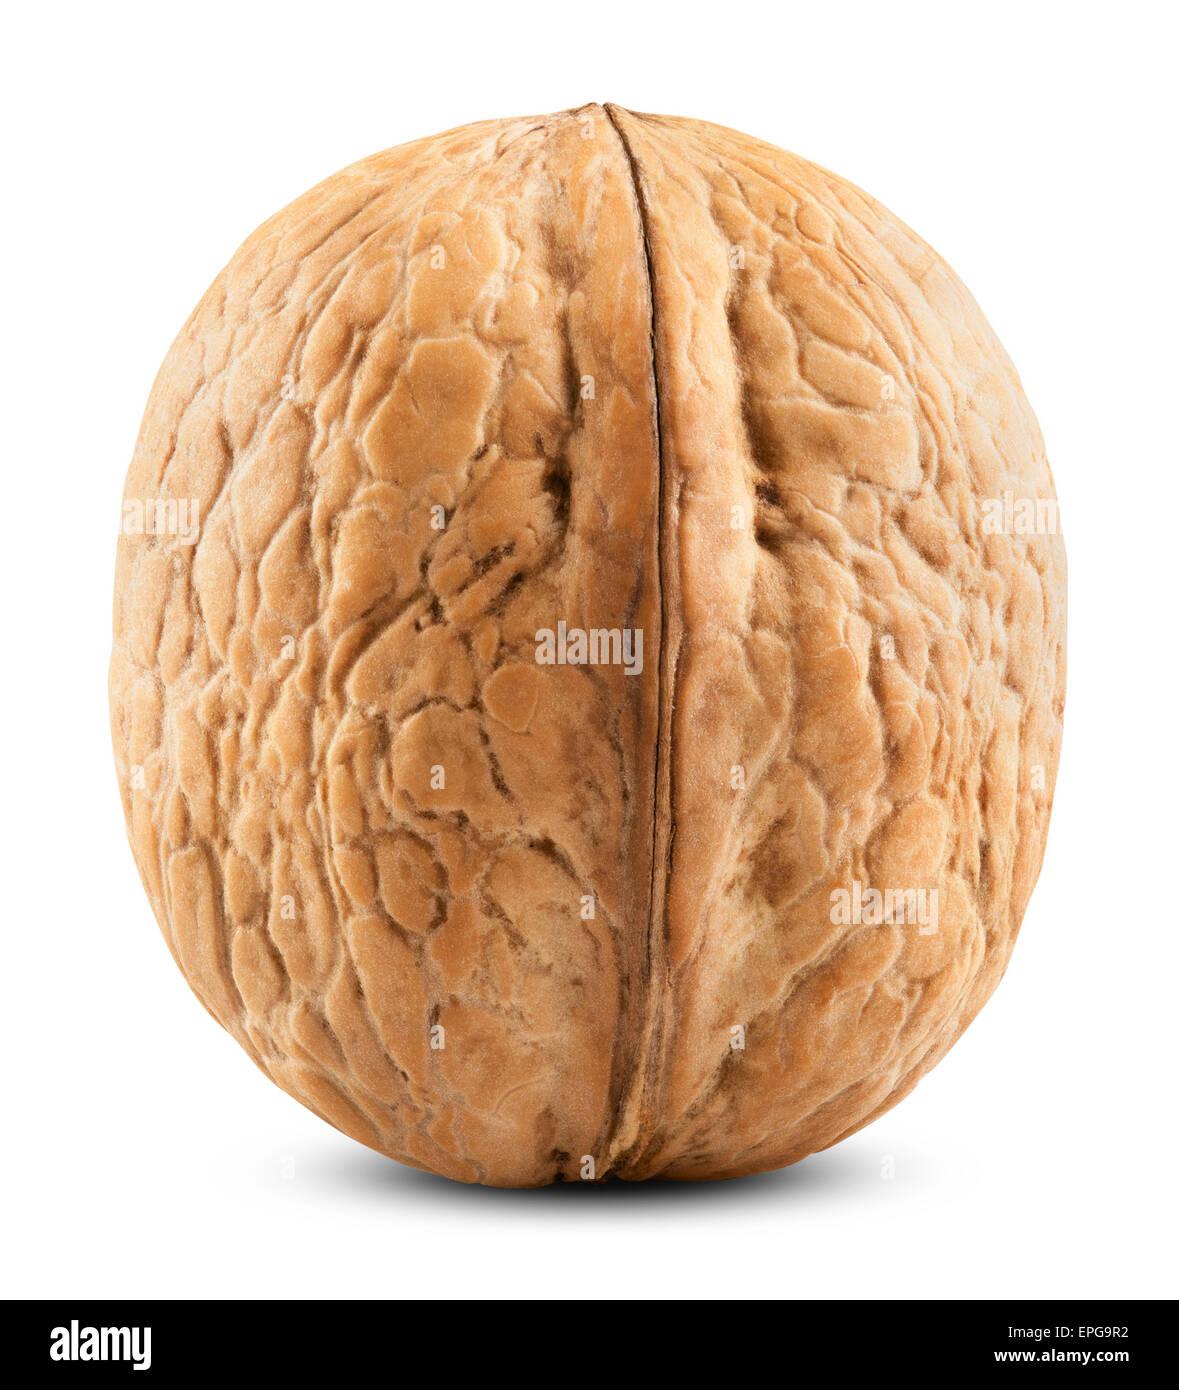 Single walnut - Stock Image